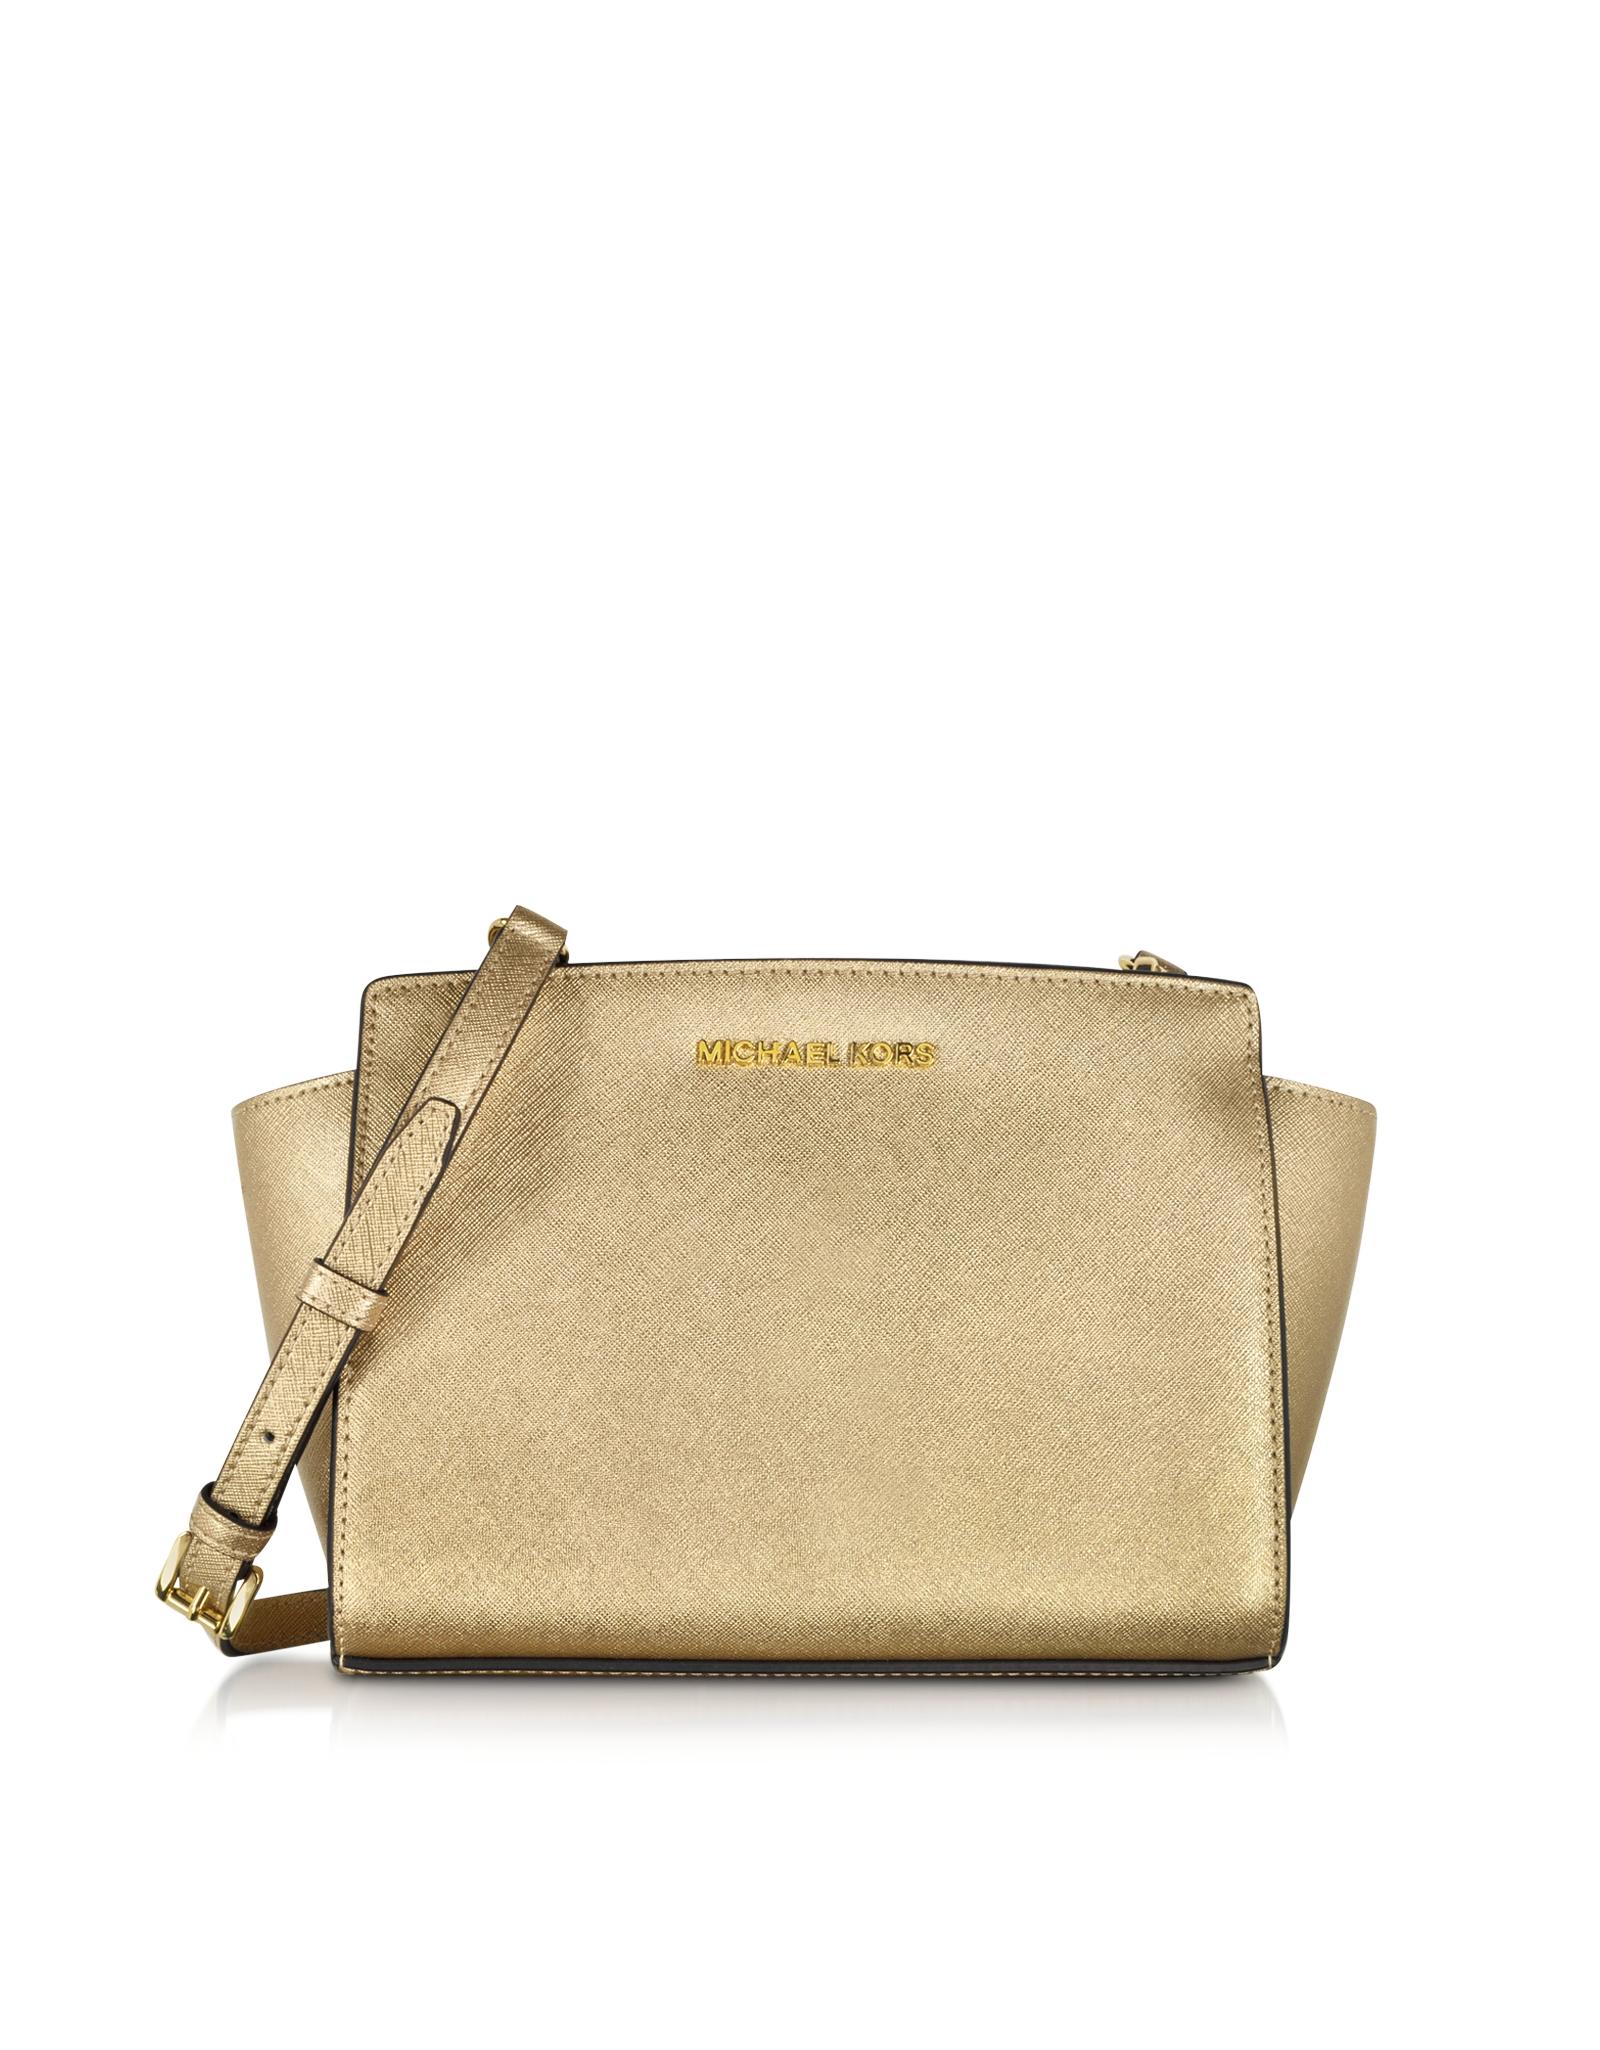 5c5424a7551c8 Lyst - Michael Kors Selma Medium Saffiano-Leather Messenger Bag in ...